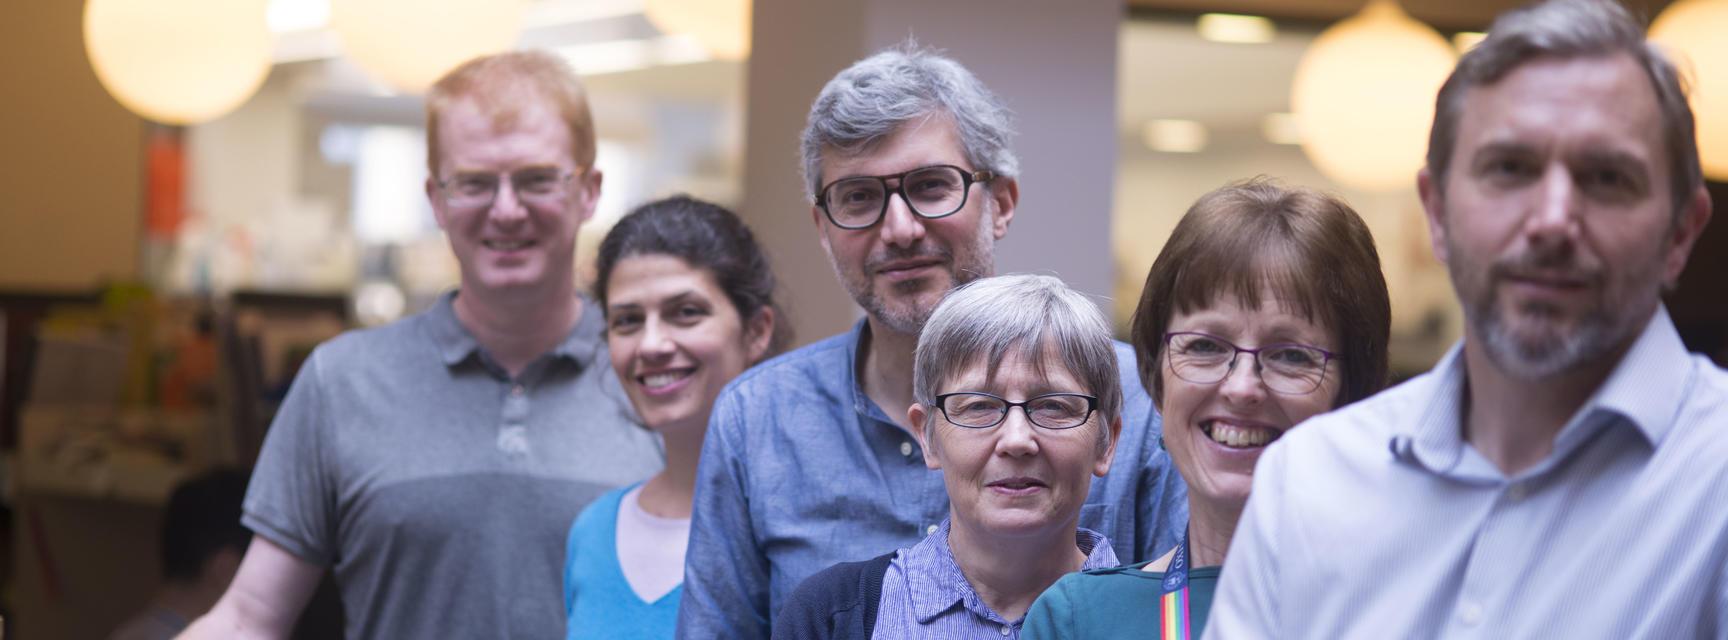 L-R: Matt Higgins, Elena Seiradake, Petros Ligoxygakis, Cathy Pears, Rita Emberton and Jason Schnell